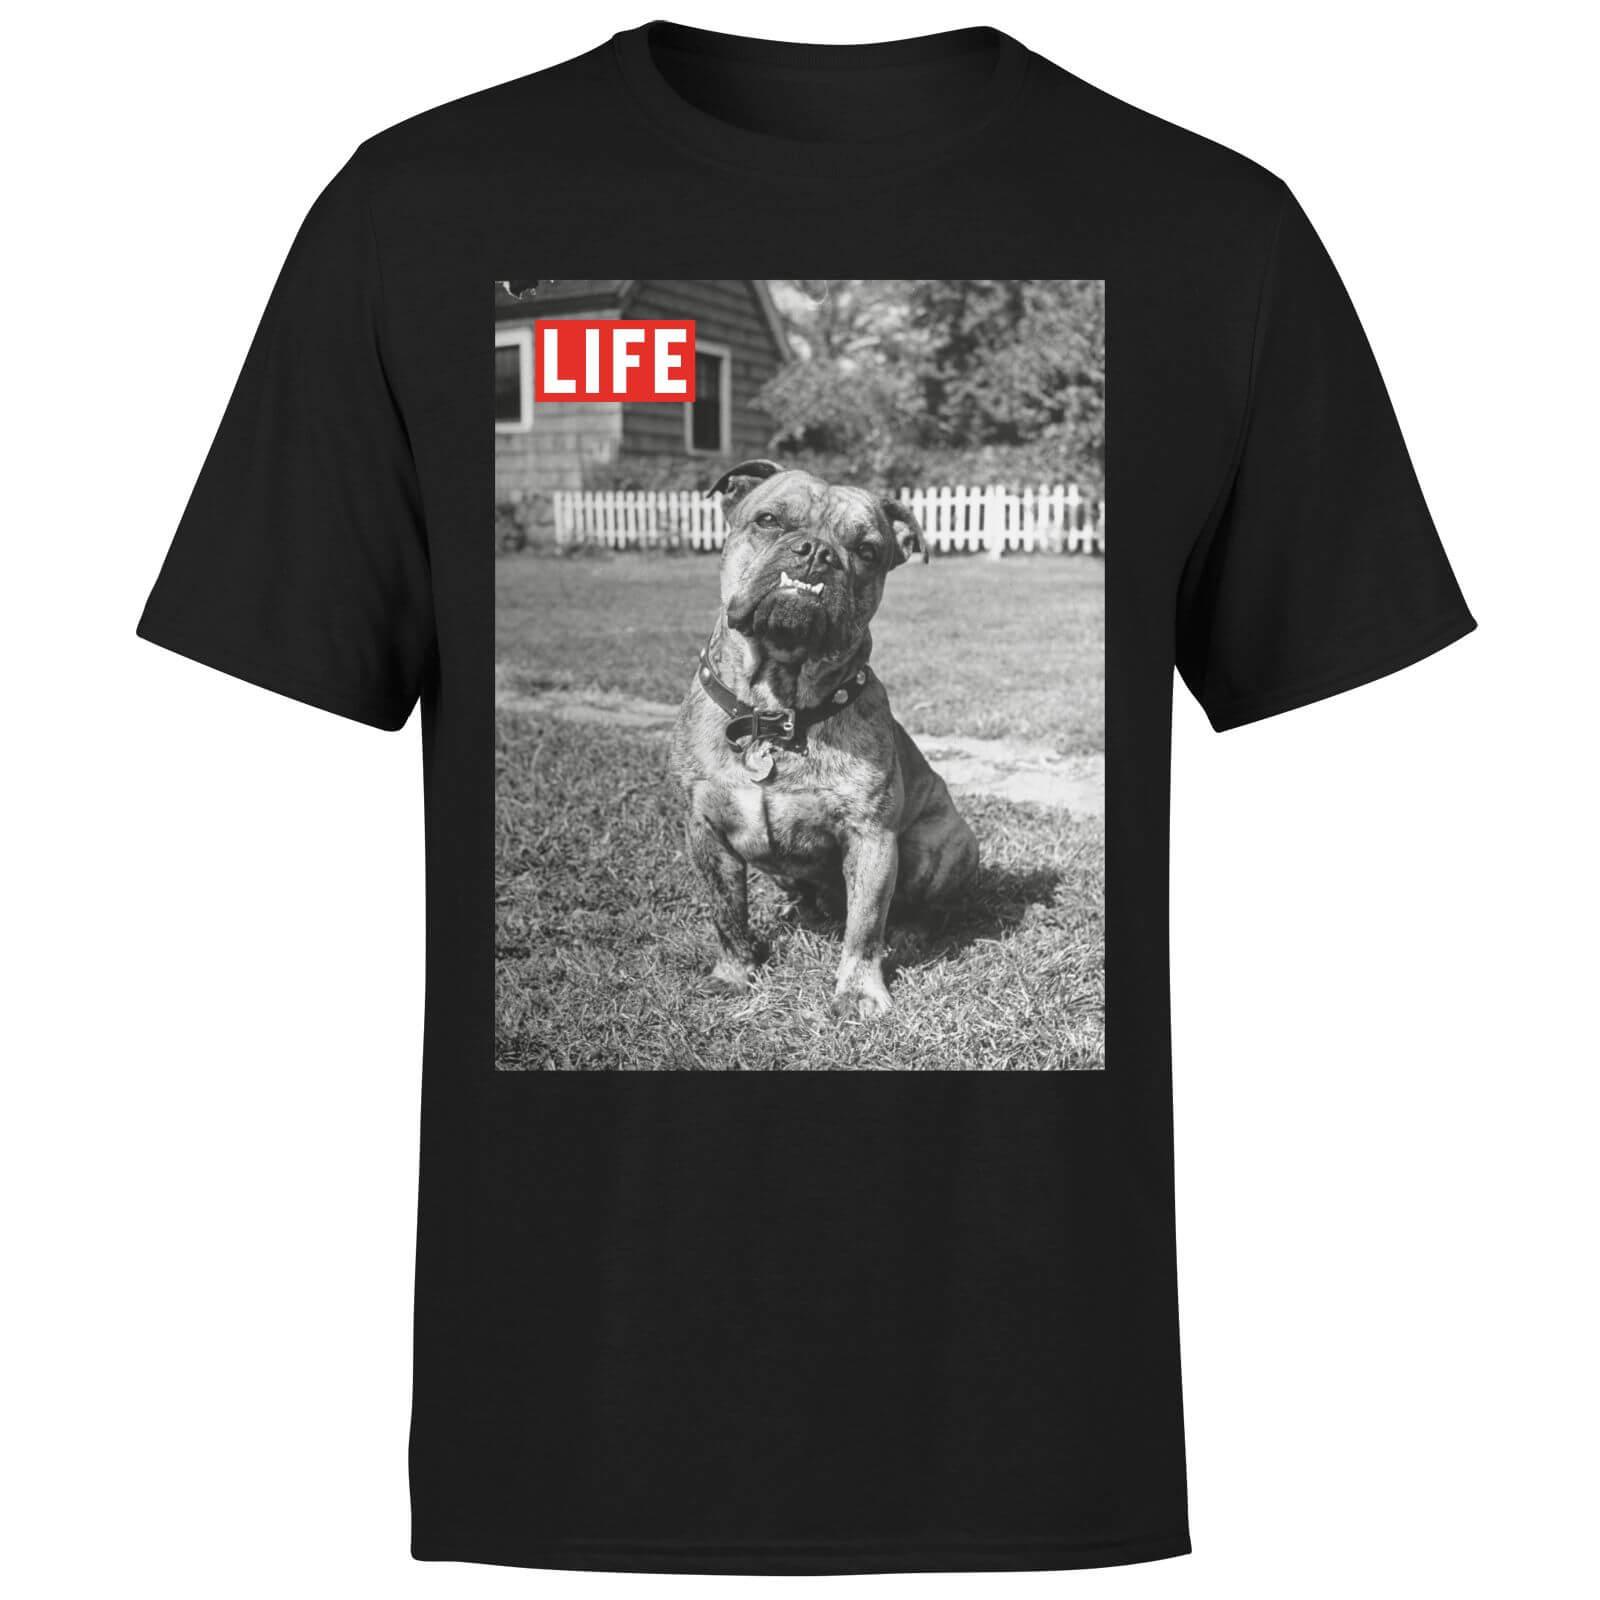 LIFE Magazine Dog Men's T-Shirt - Black - XXL - Black-male